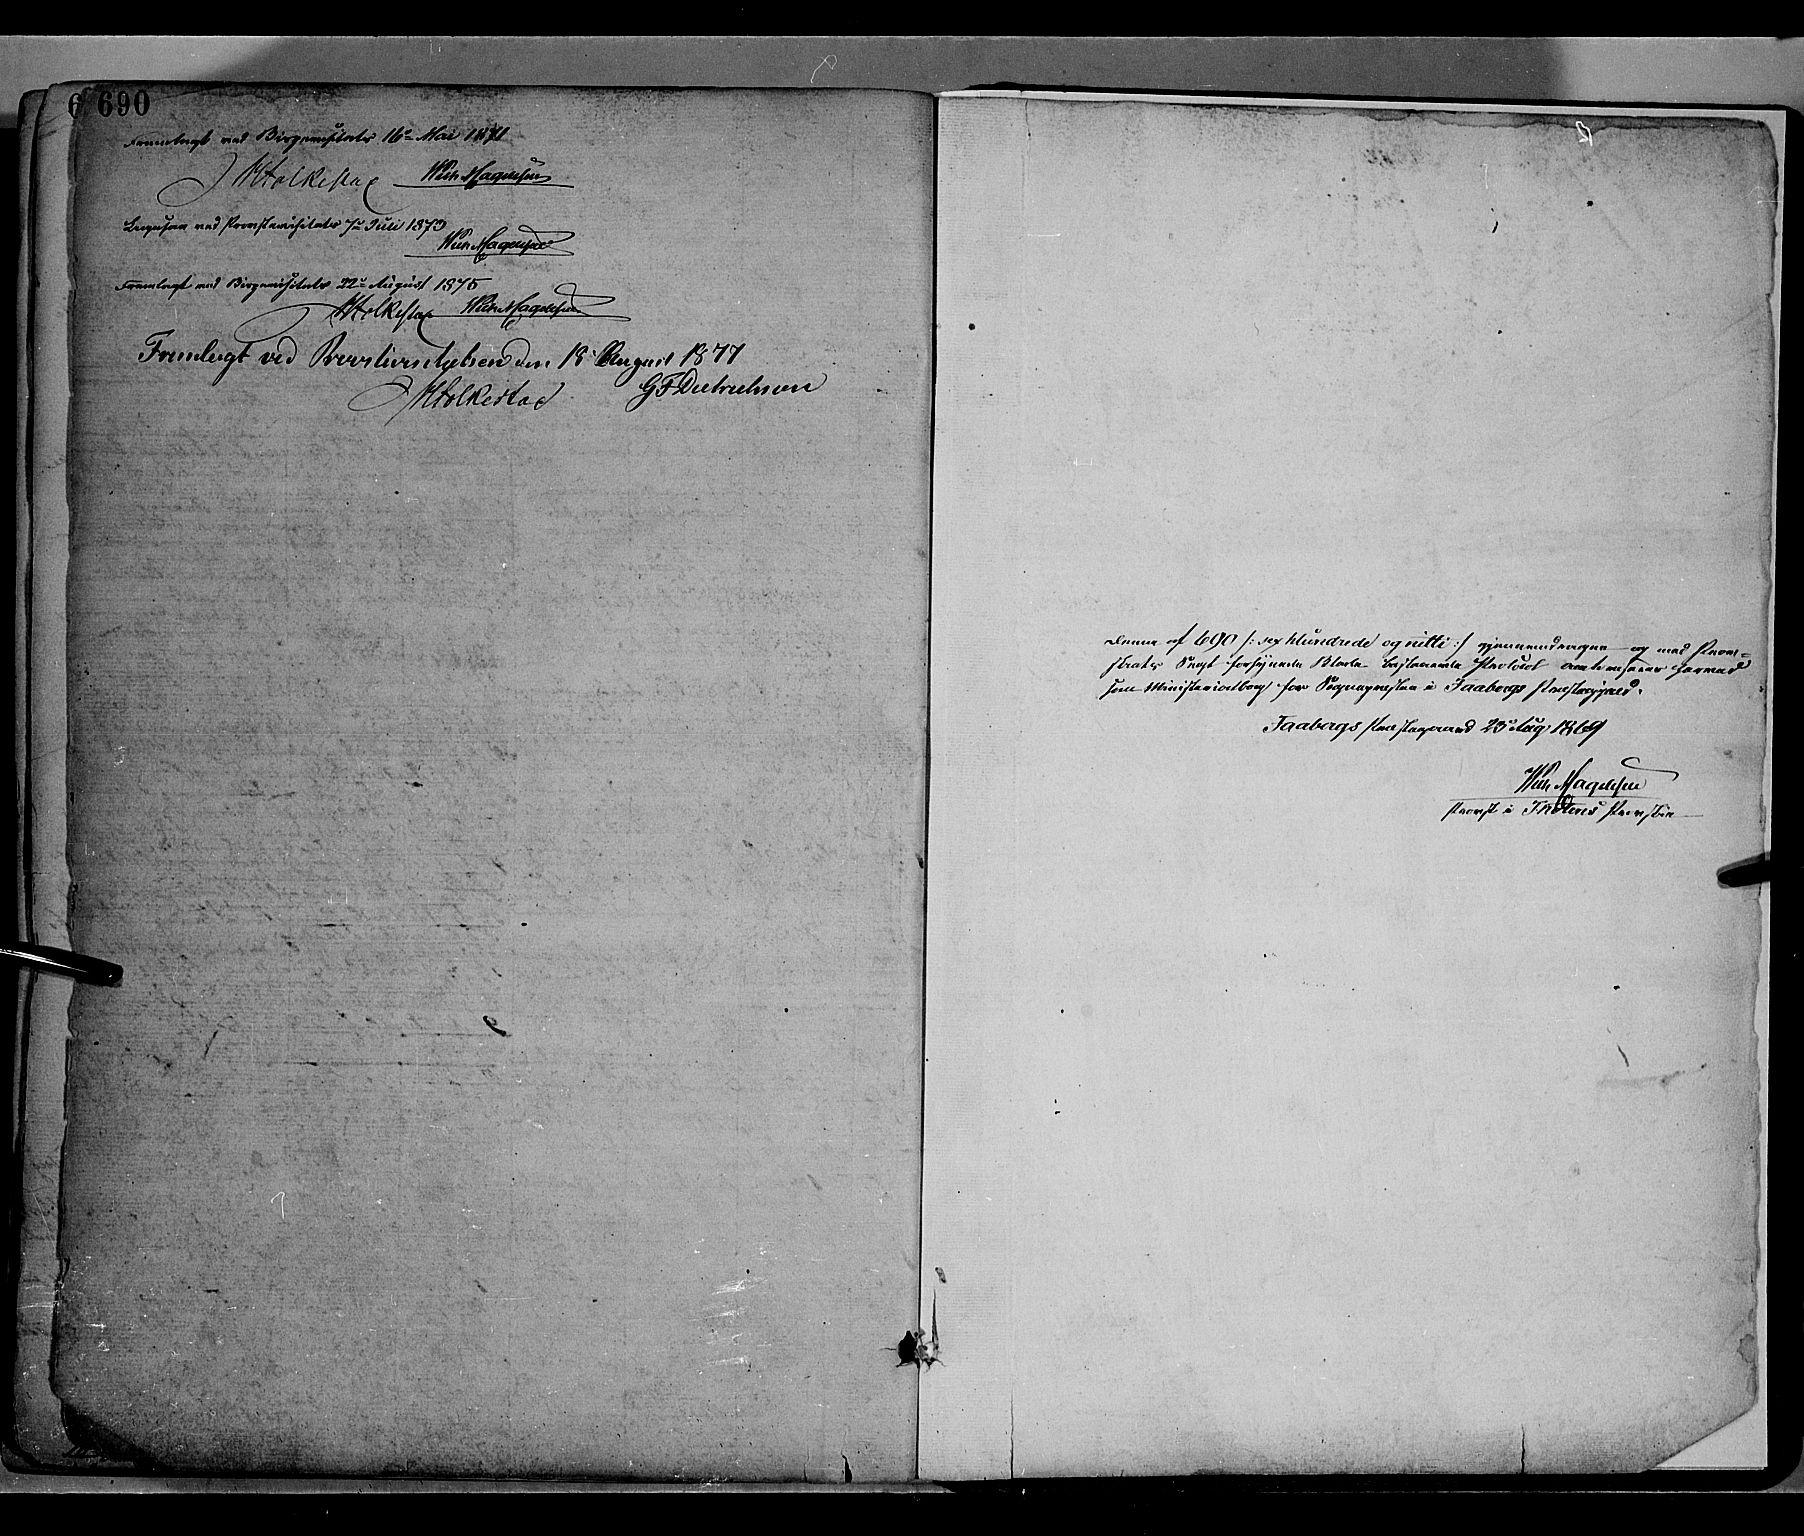 SAH, Fåberg prestekontor, Ministerialbok nr. 7, 1868-1878, s. 690